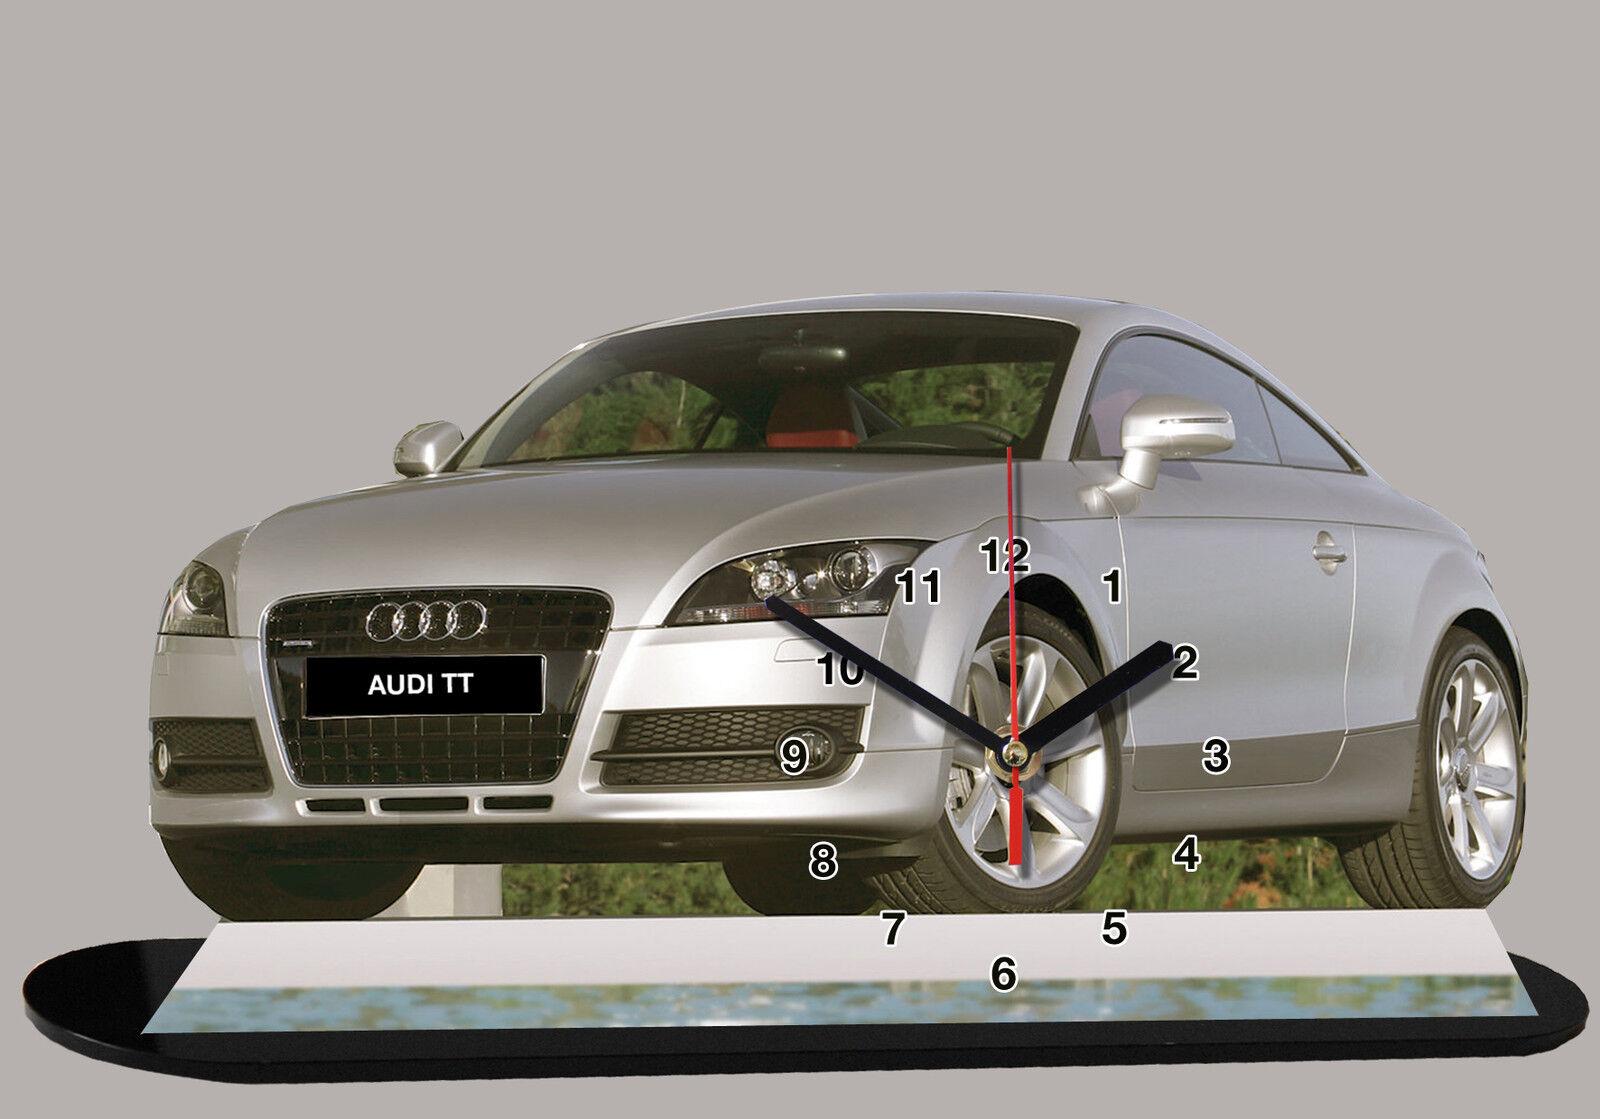 MINIATURE, MODEL CARS, AUDI TT - - - 03 en horloge e060b9